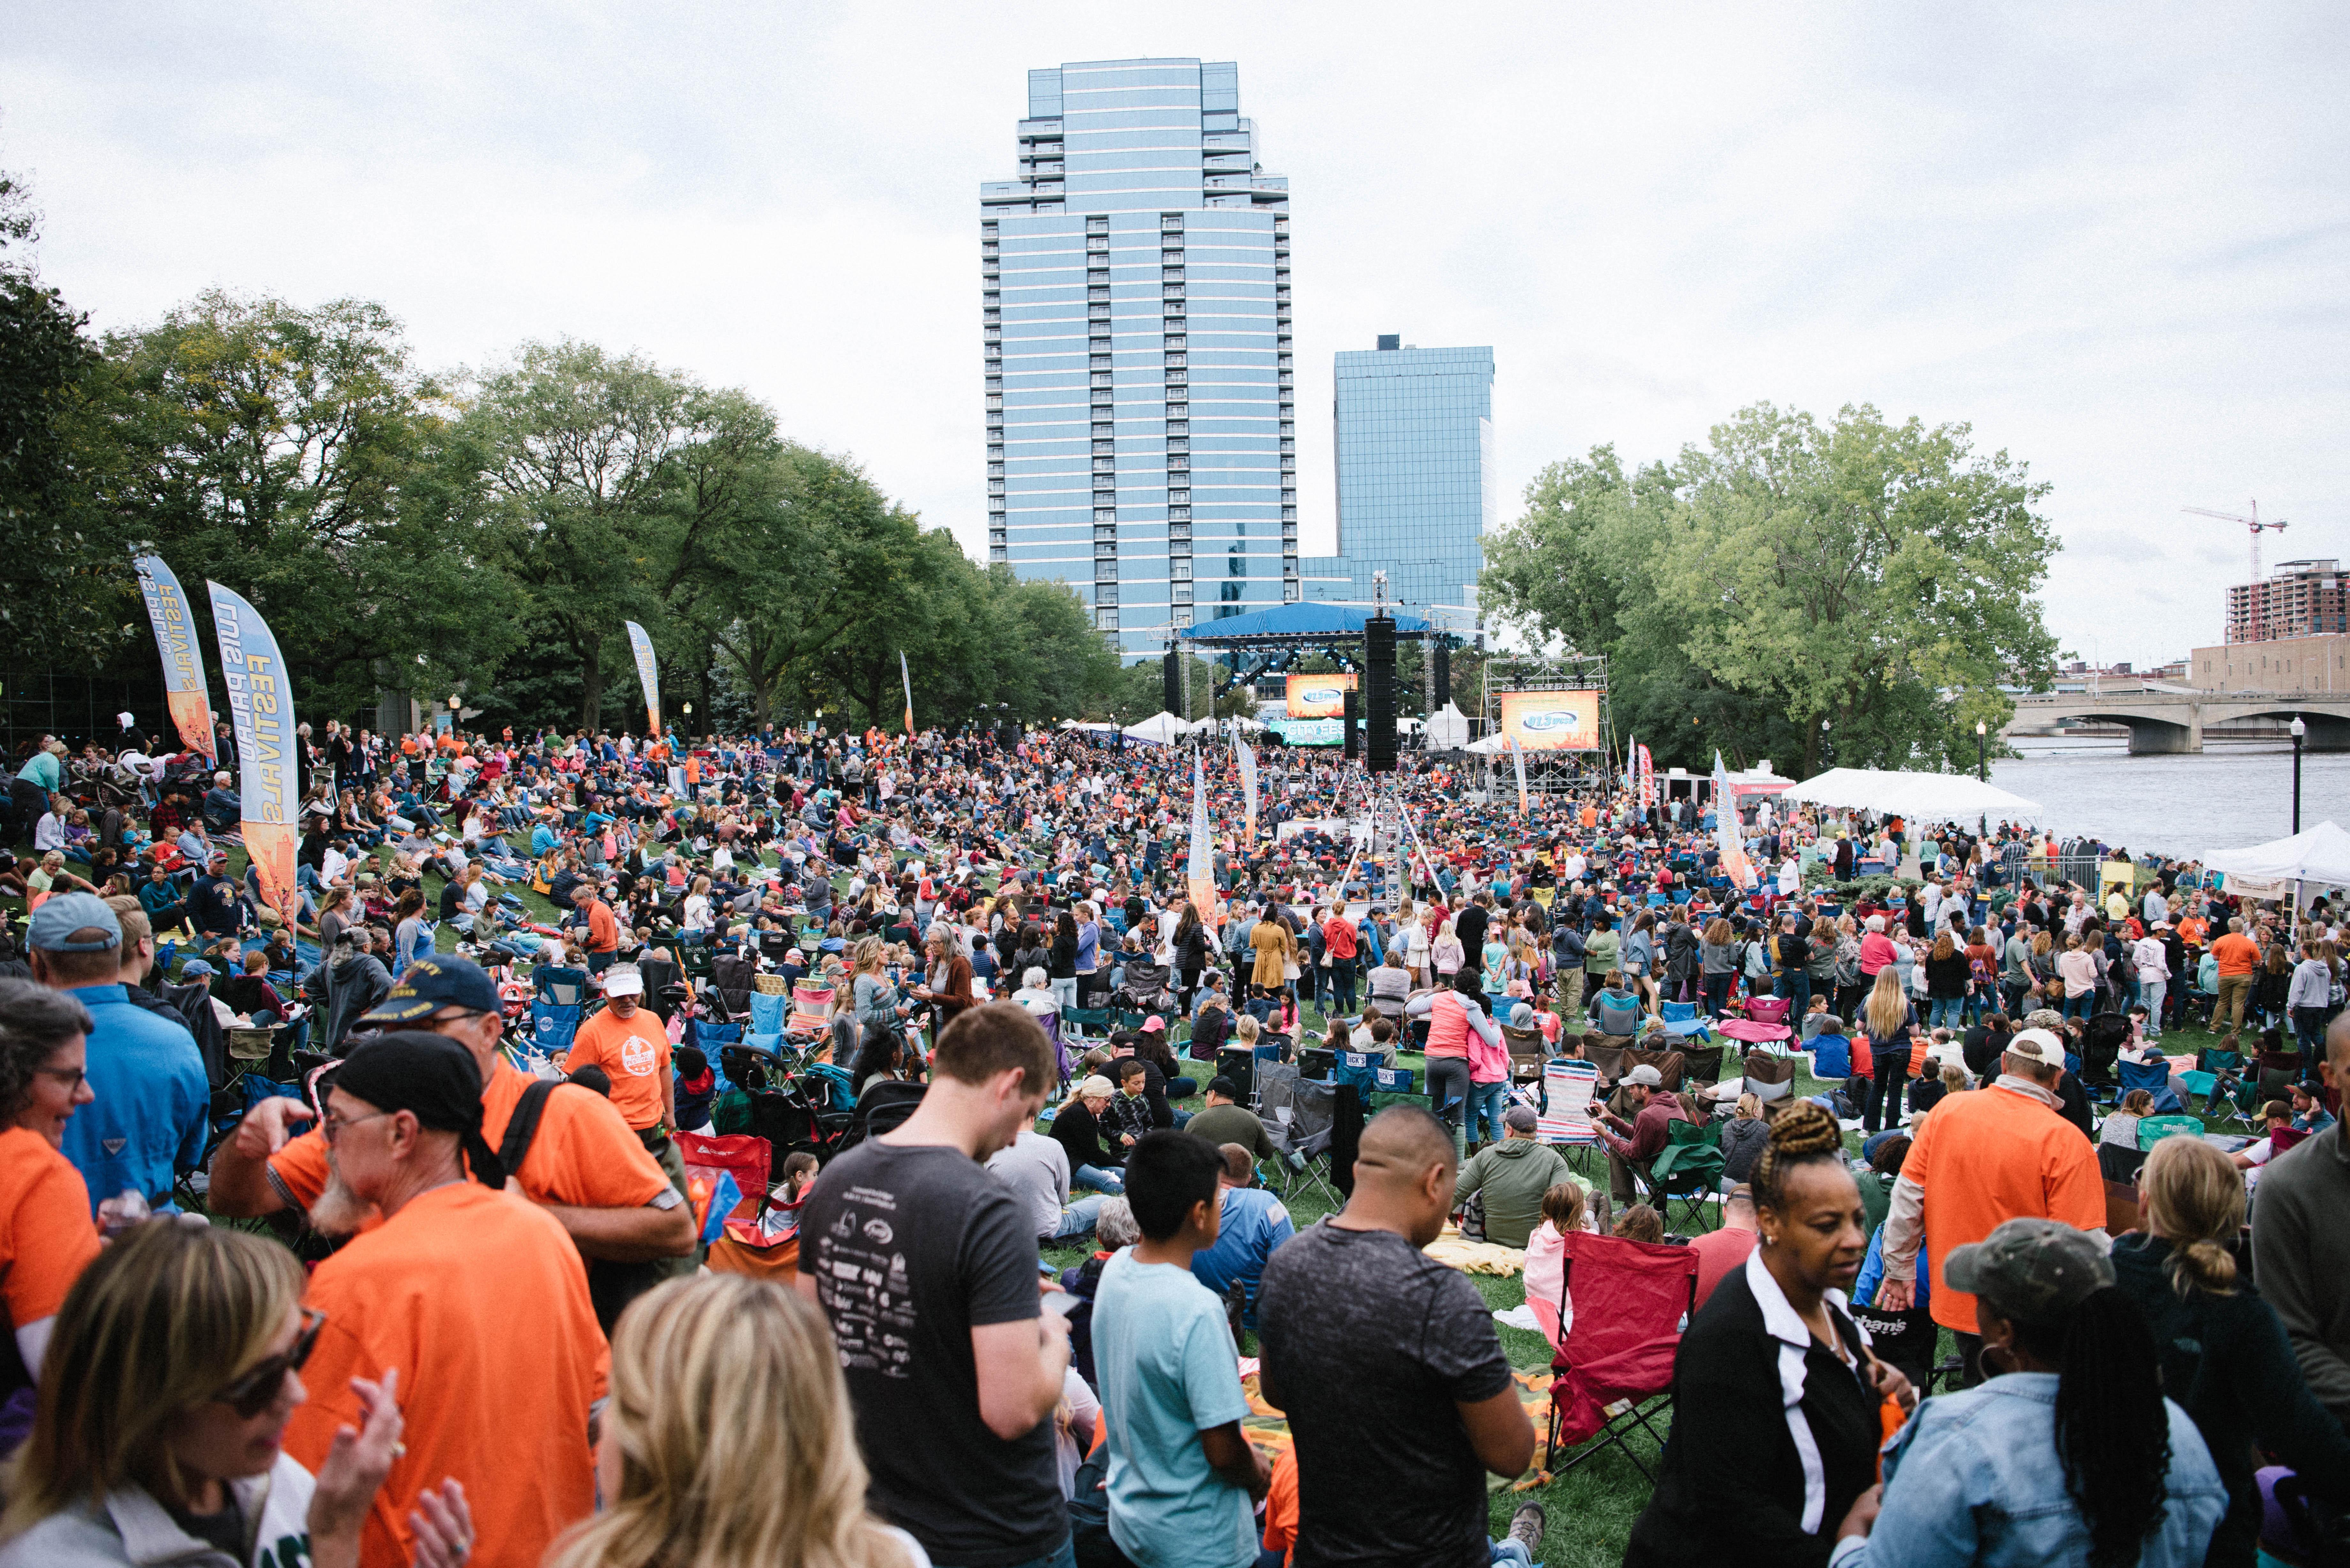 Sharing the Gospel in post-CityFest West Michigan